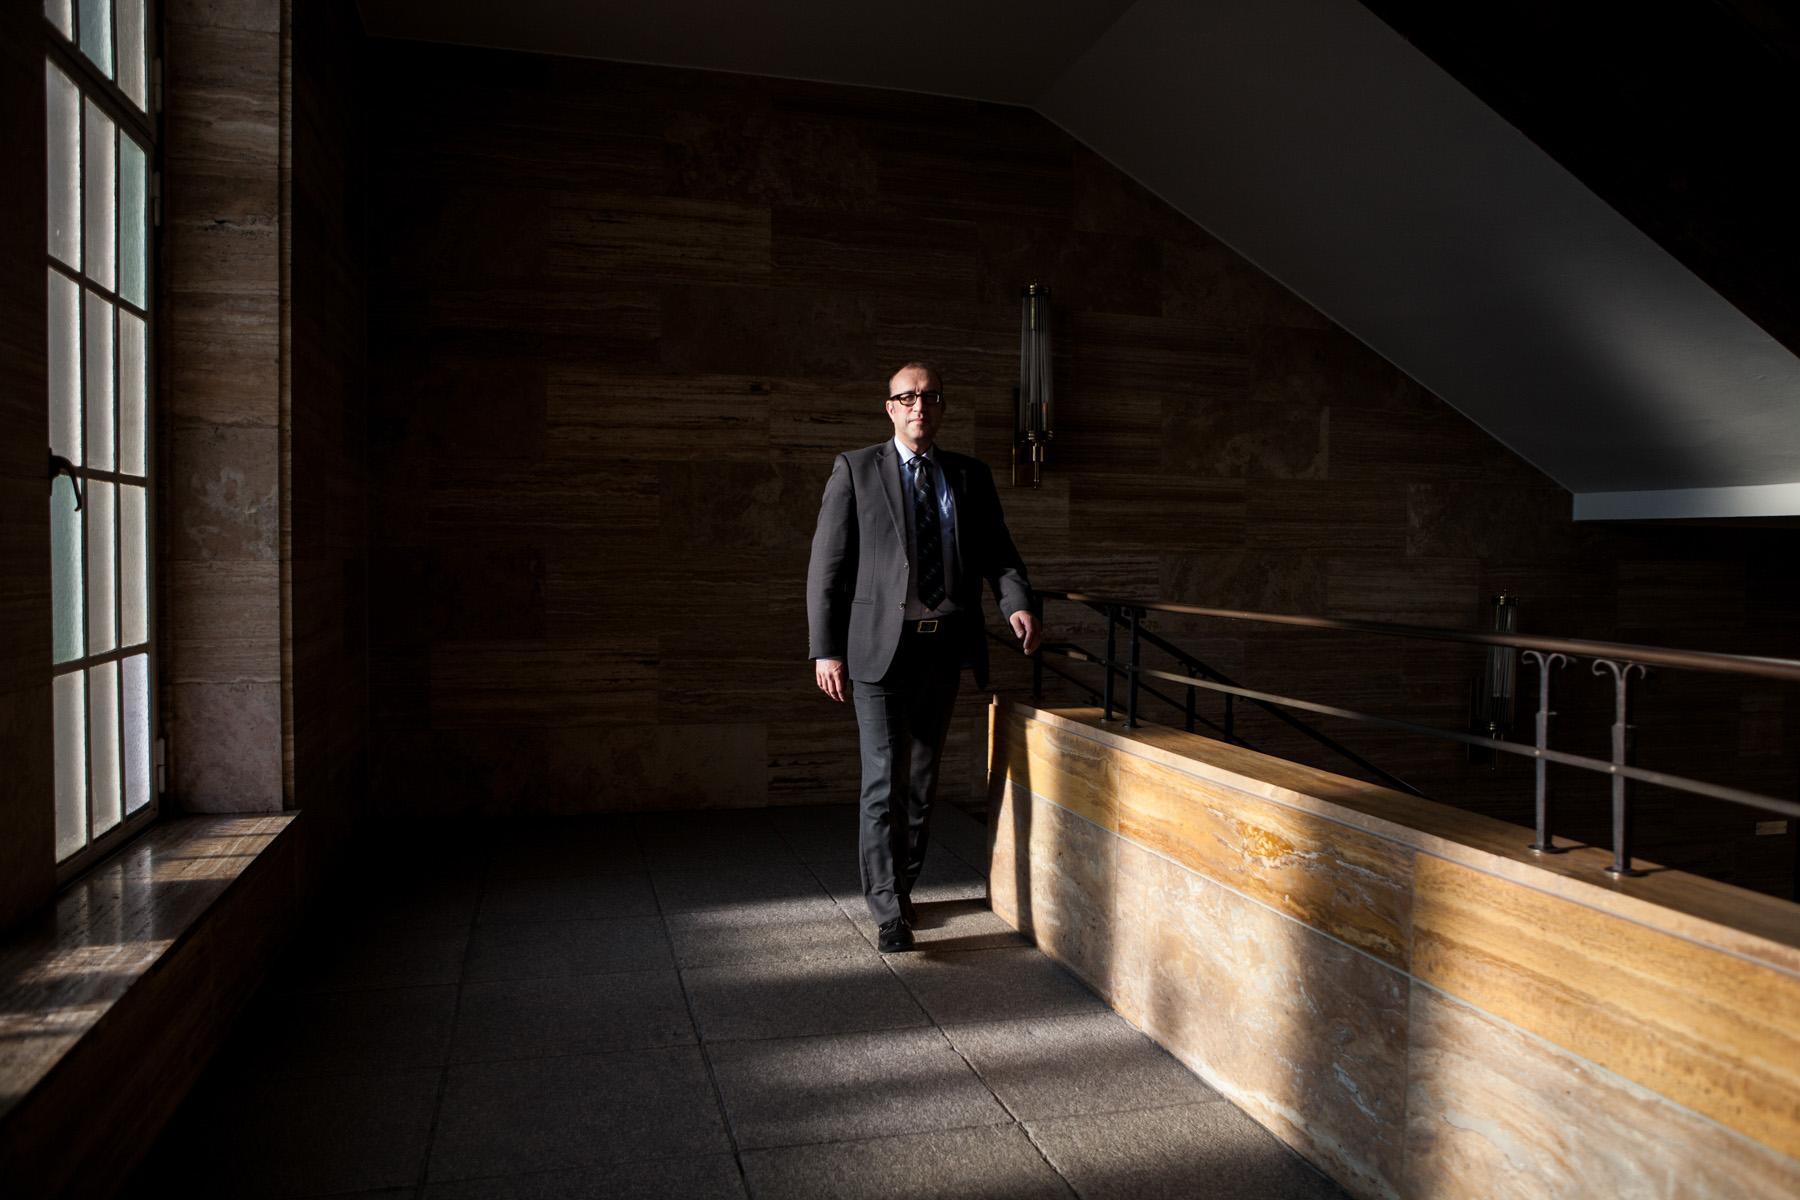 Apostolos Tsalastras, mayor of the German city Oberhausen, is walking through the city's city hall.